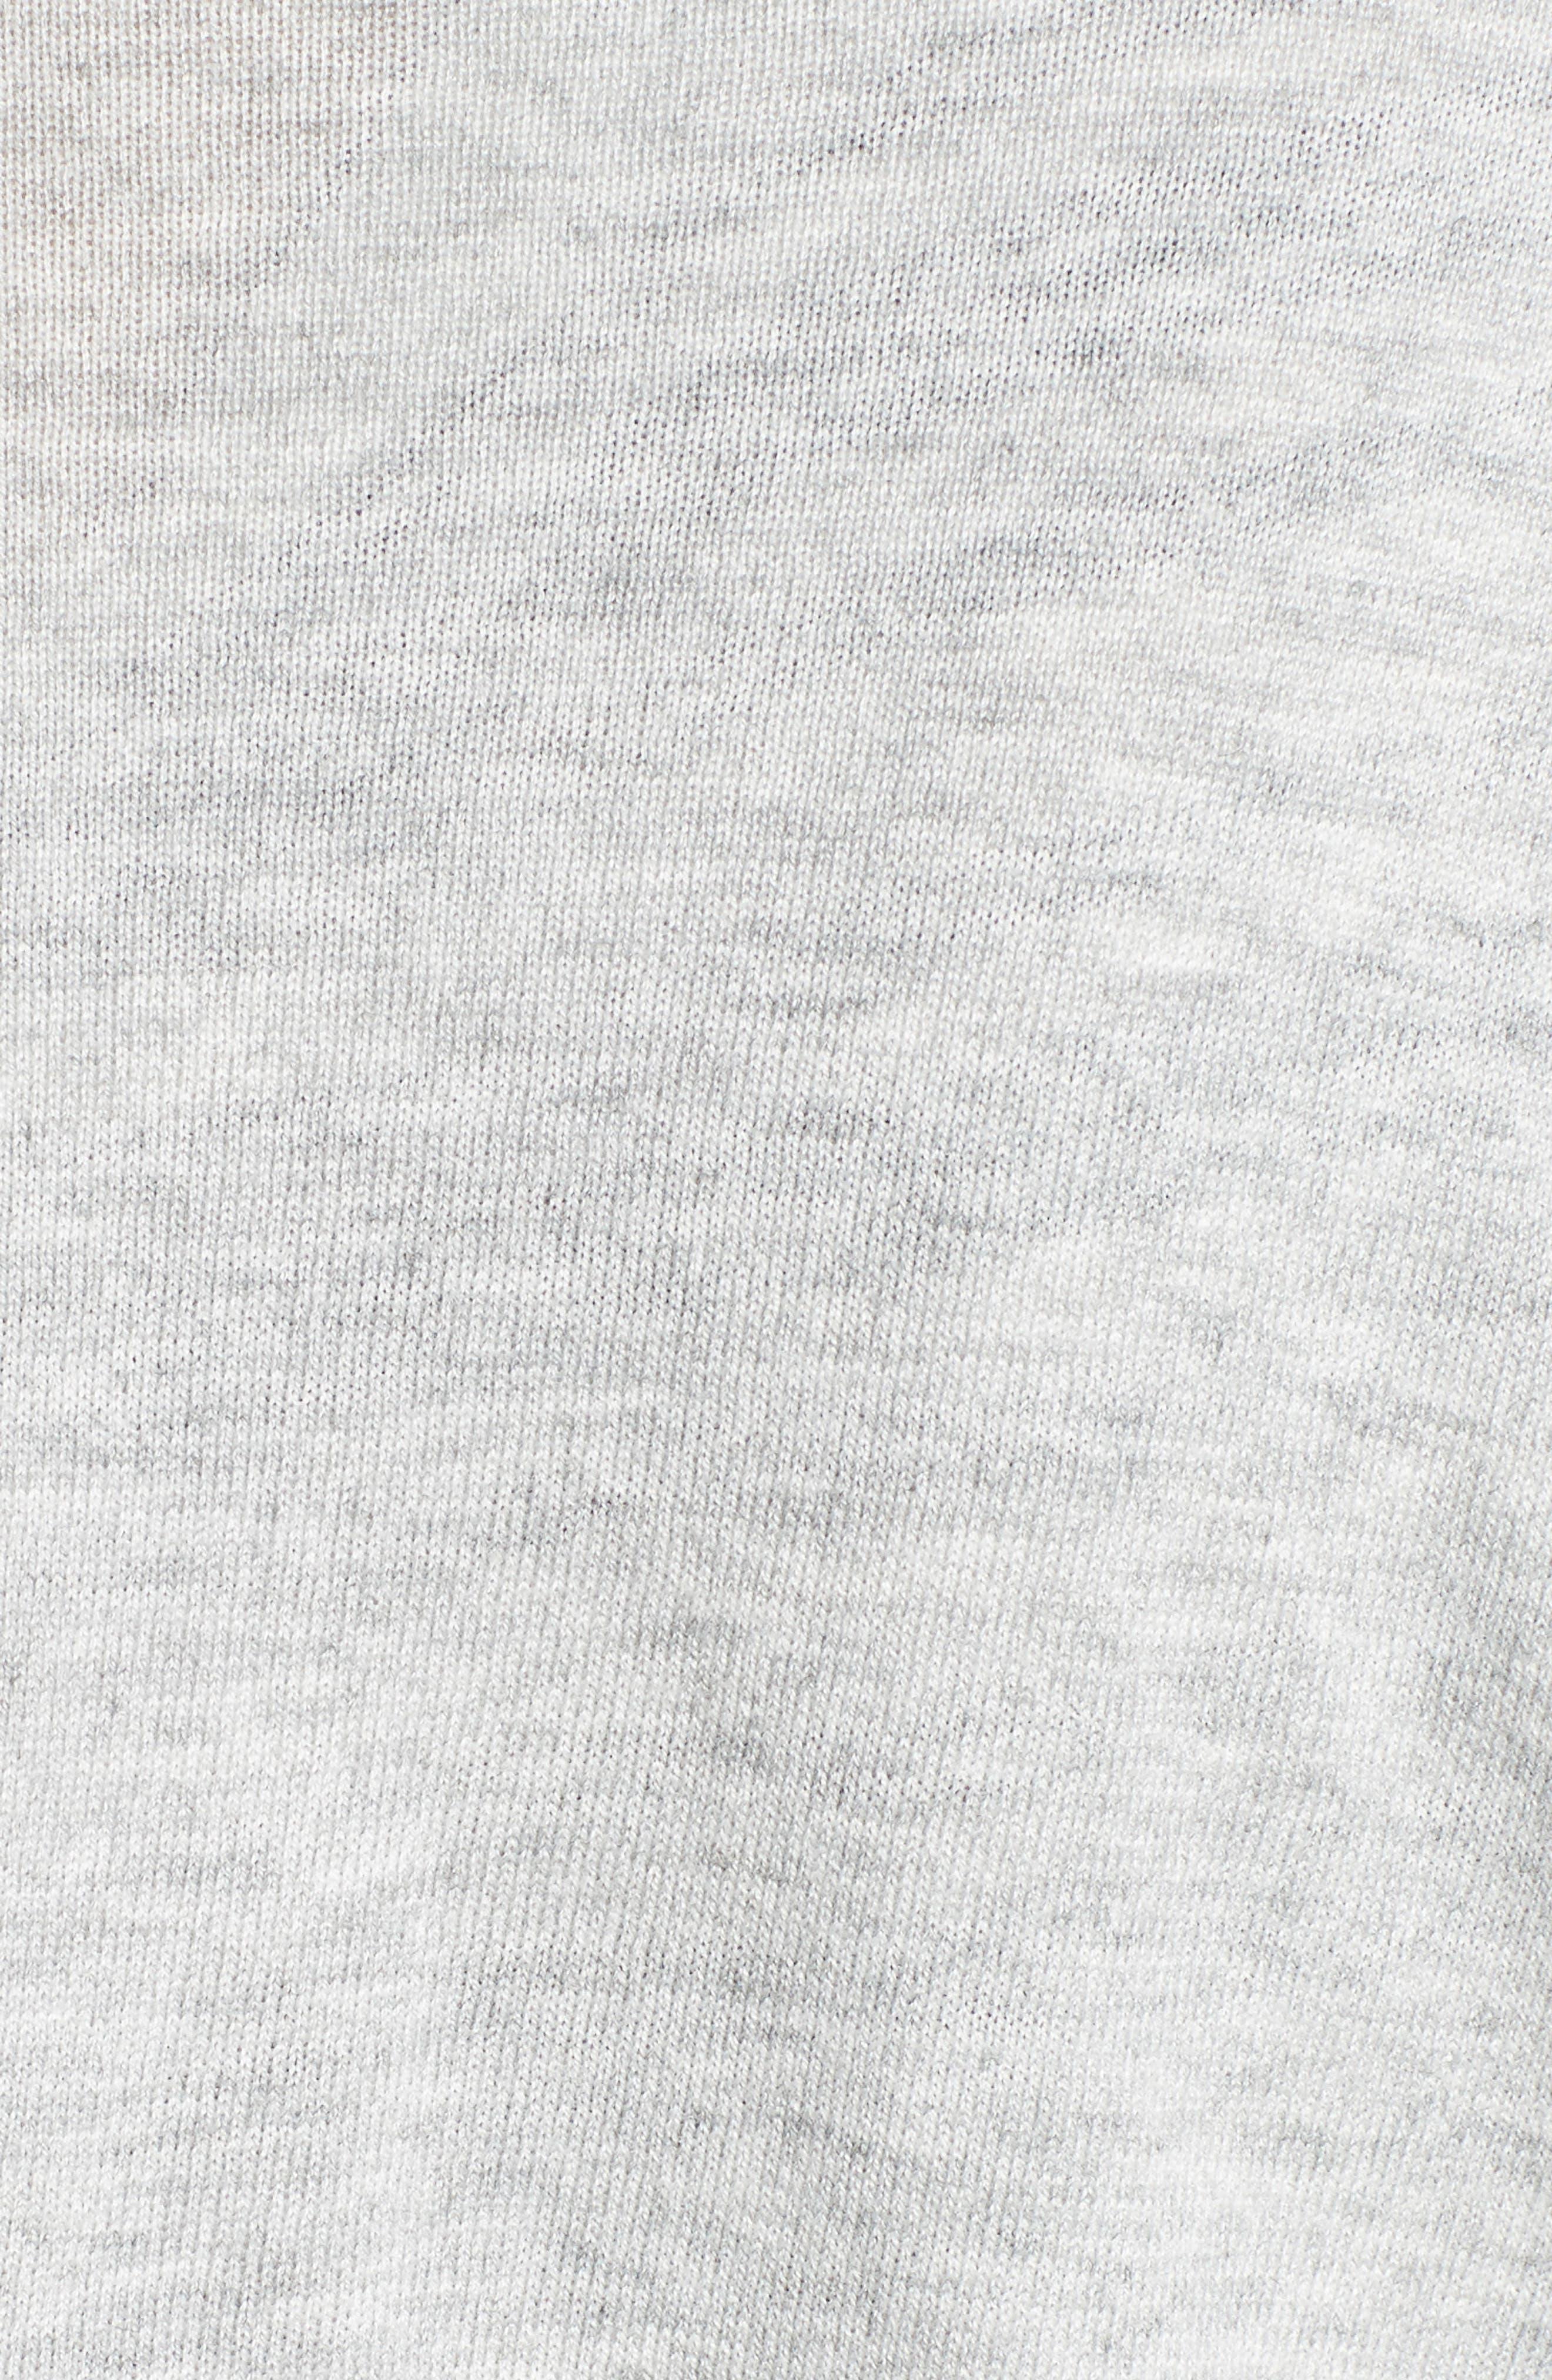 Marlis Knit Cardigan,                             Alternate thumbnail 13, color,